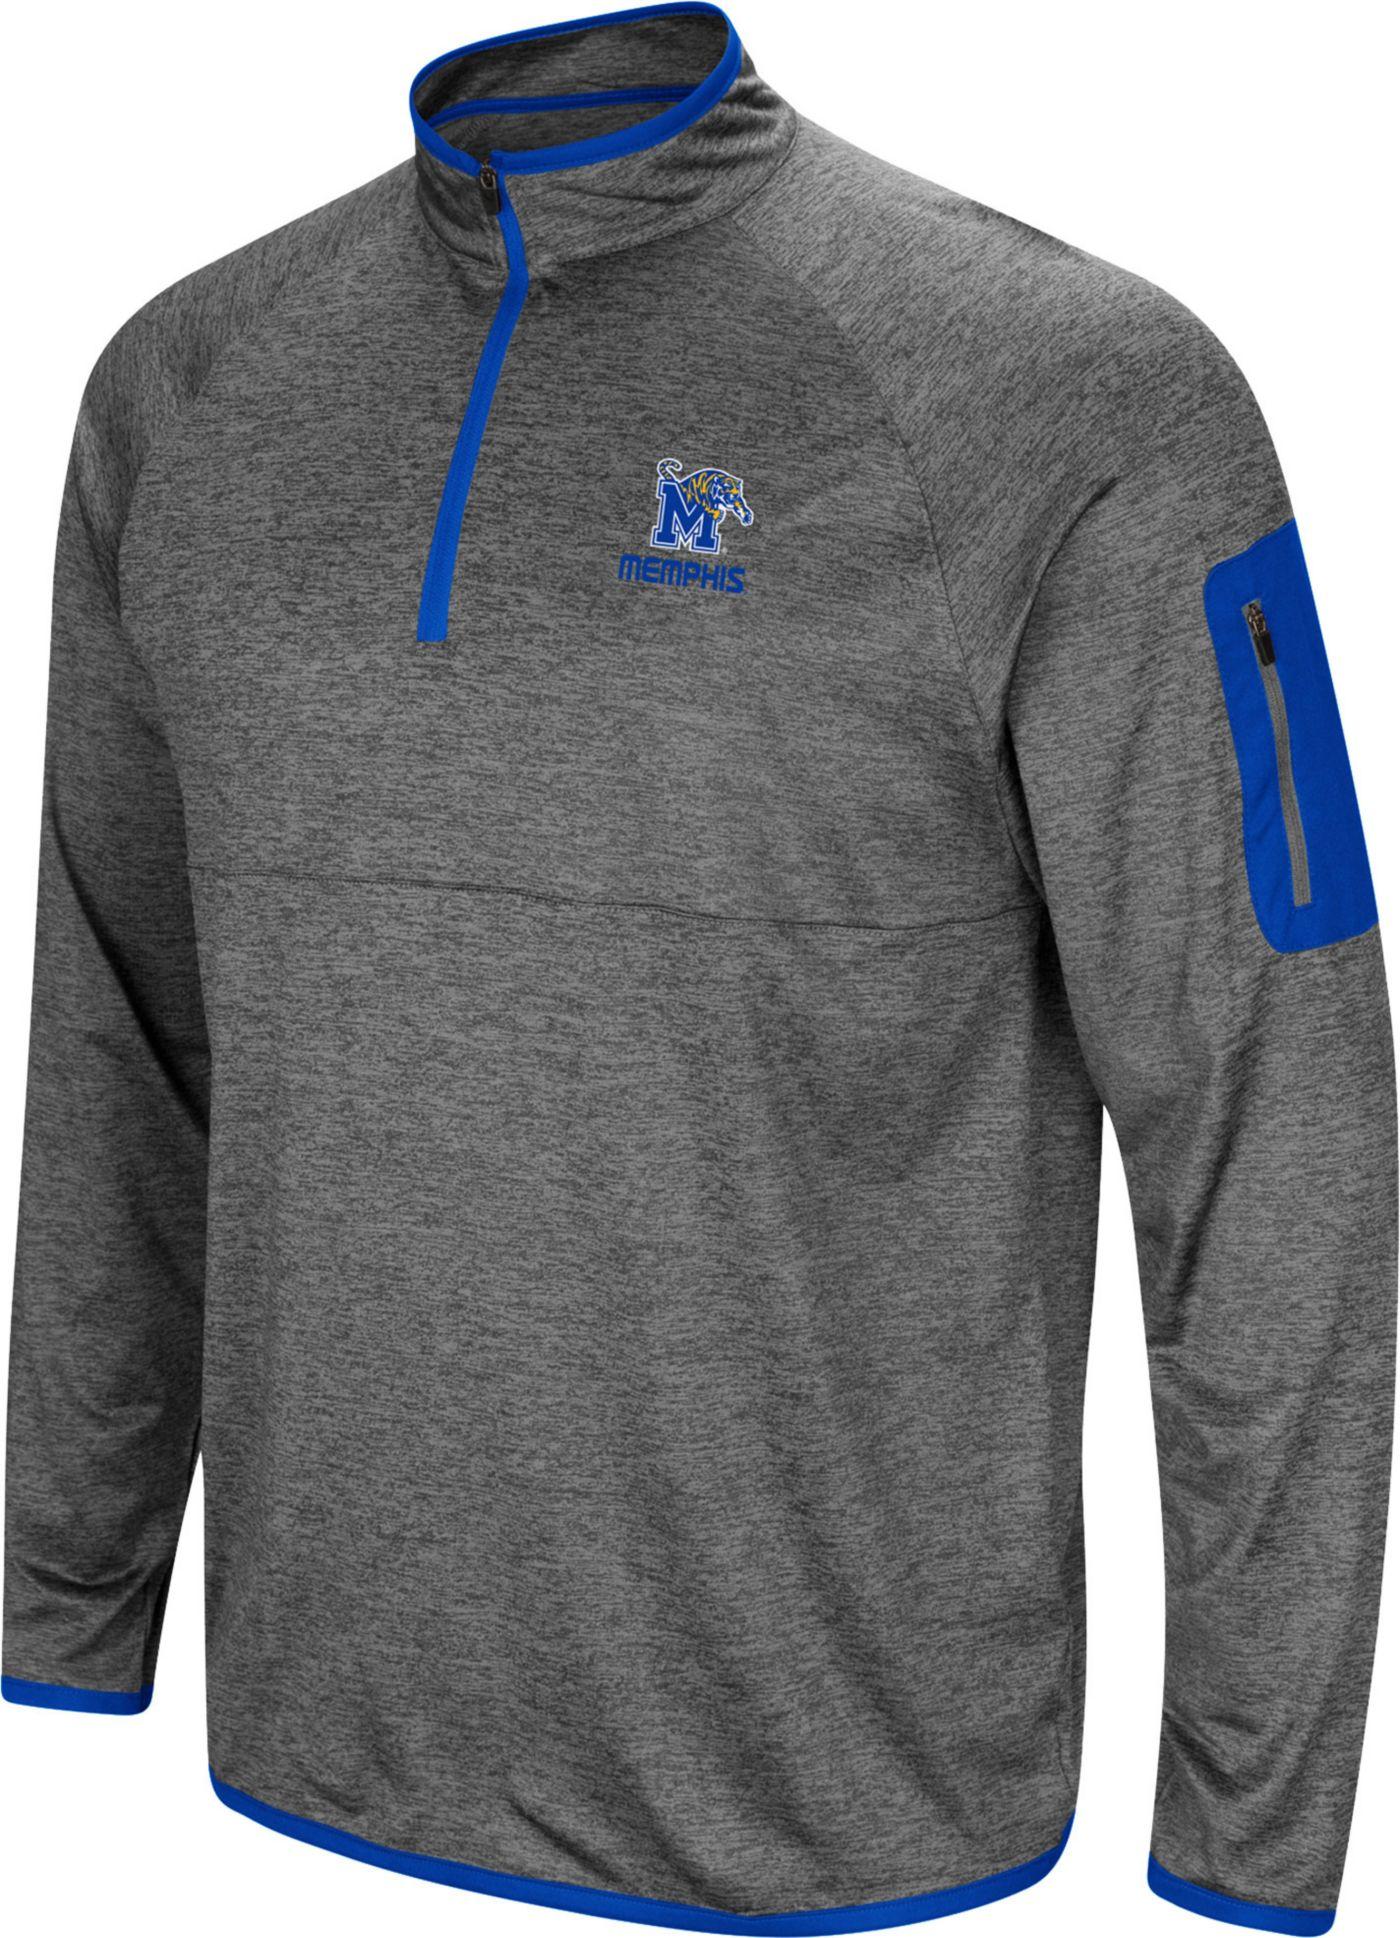 Colosseum Men's Memphis Tigers Grey Indus River Quarter-Zip Shirt